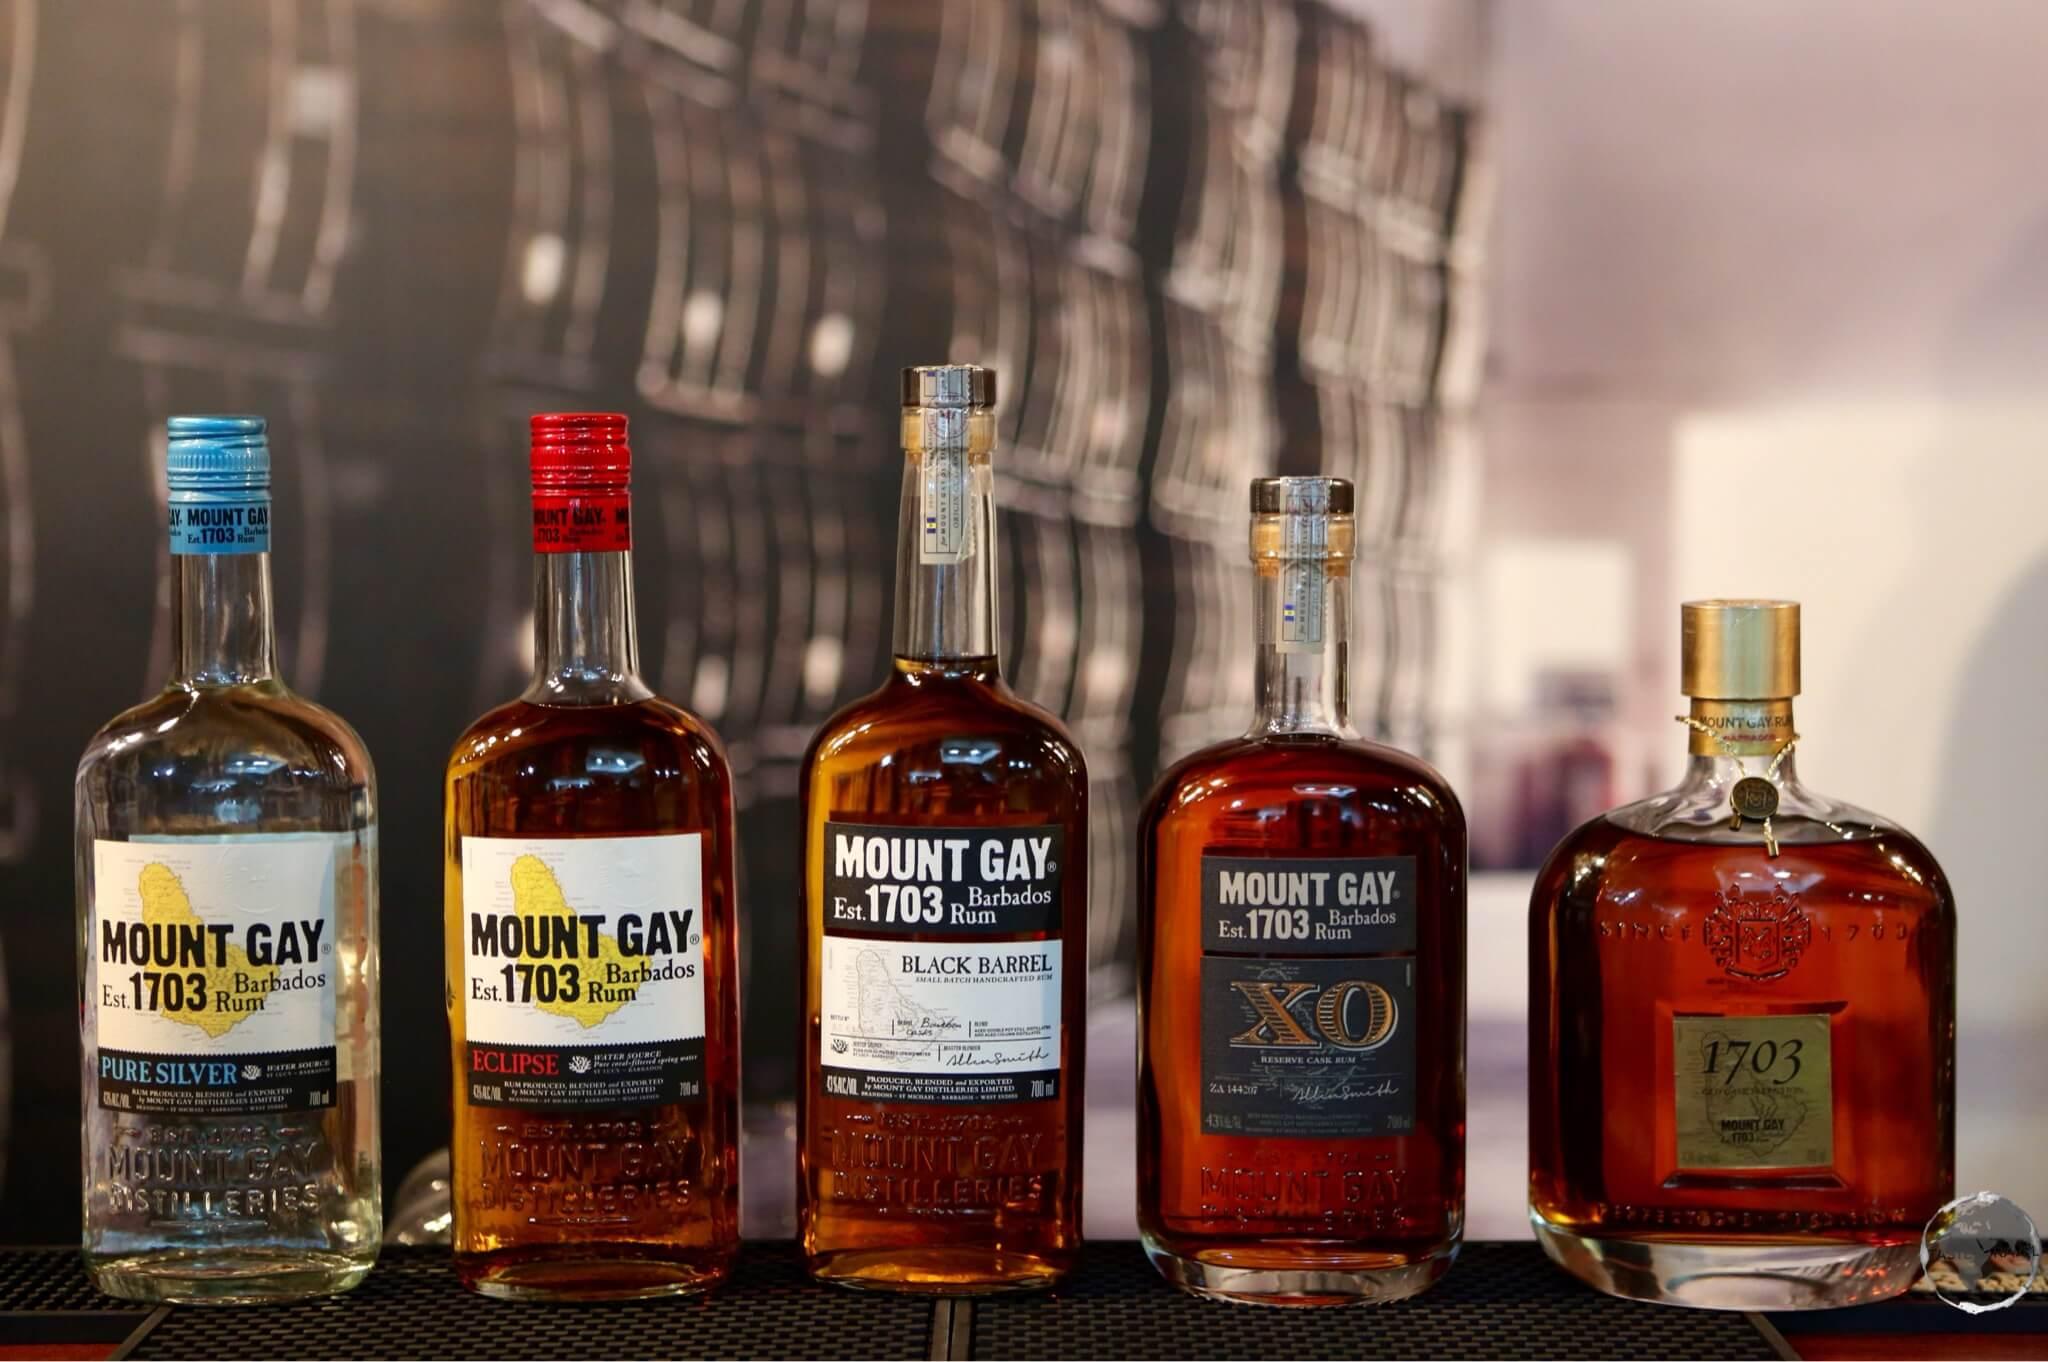 Mount Gay rum product range.